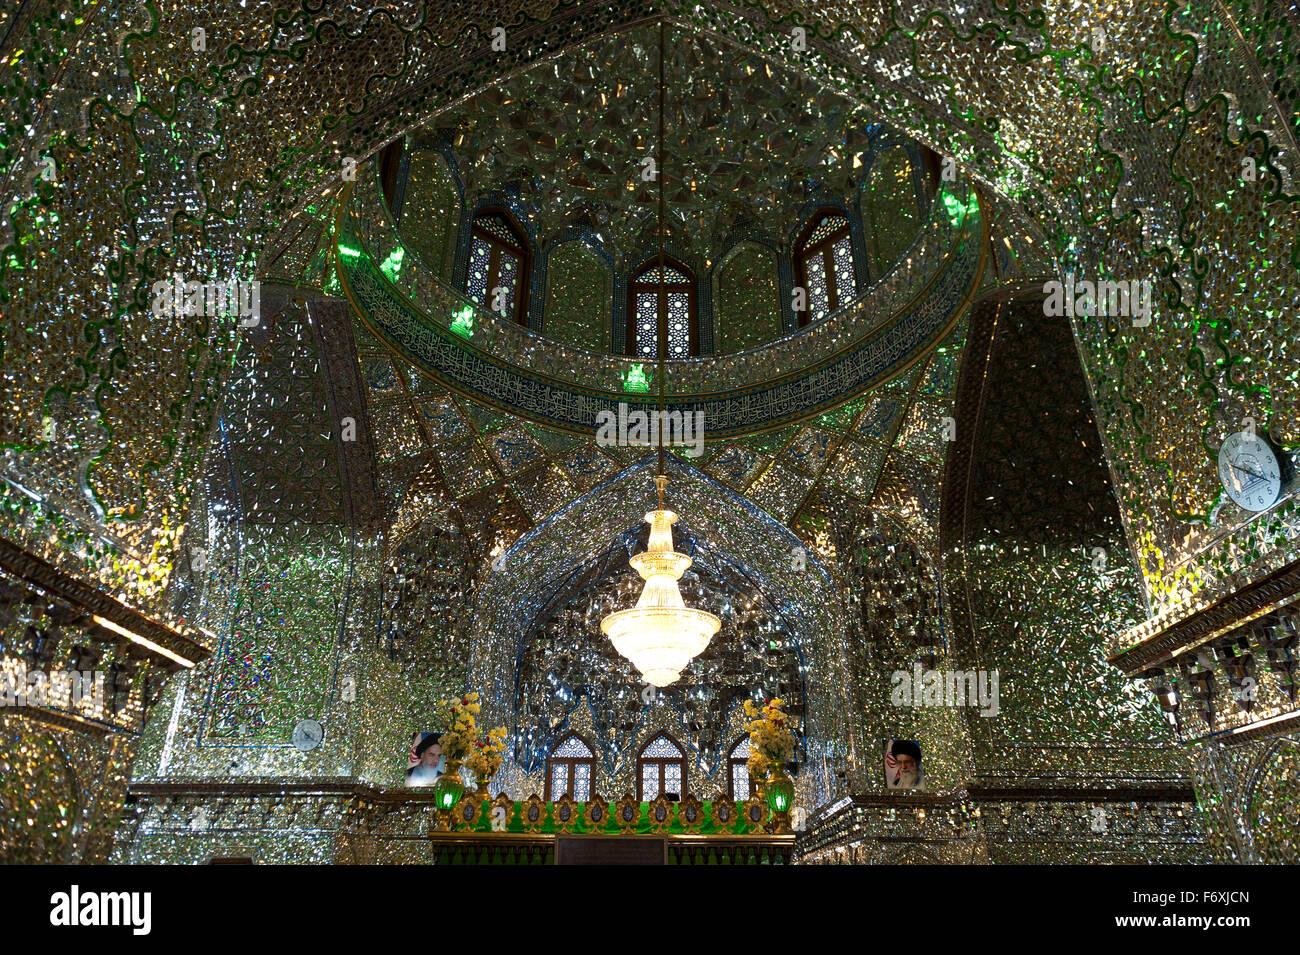 Glistening interior with mirror mosaics, mausoleum, tombs, Shāh Chérāgh, Shiraz, Iran - Stock Image